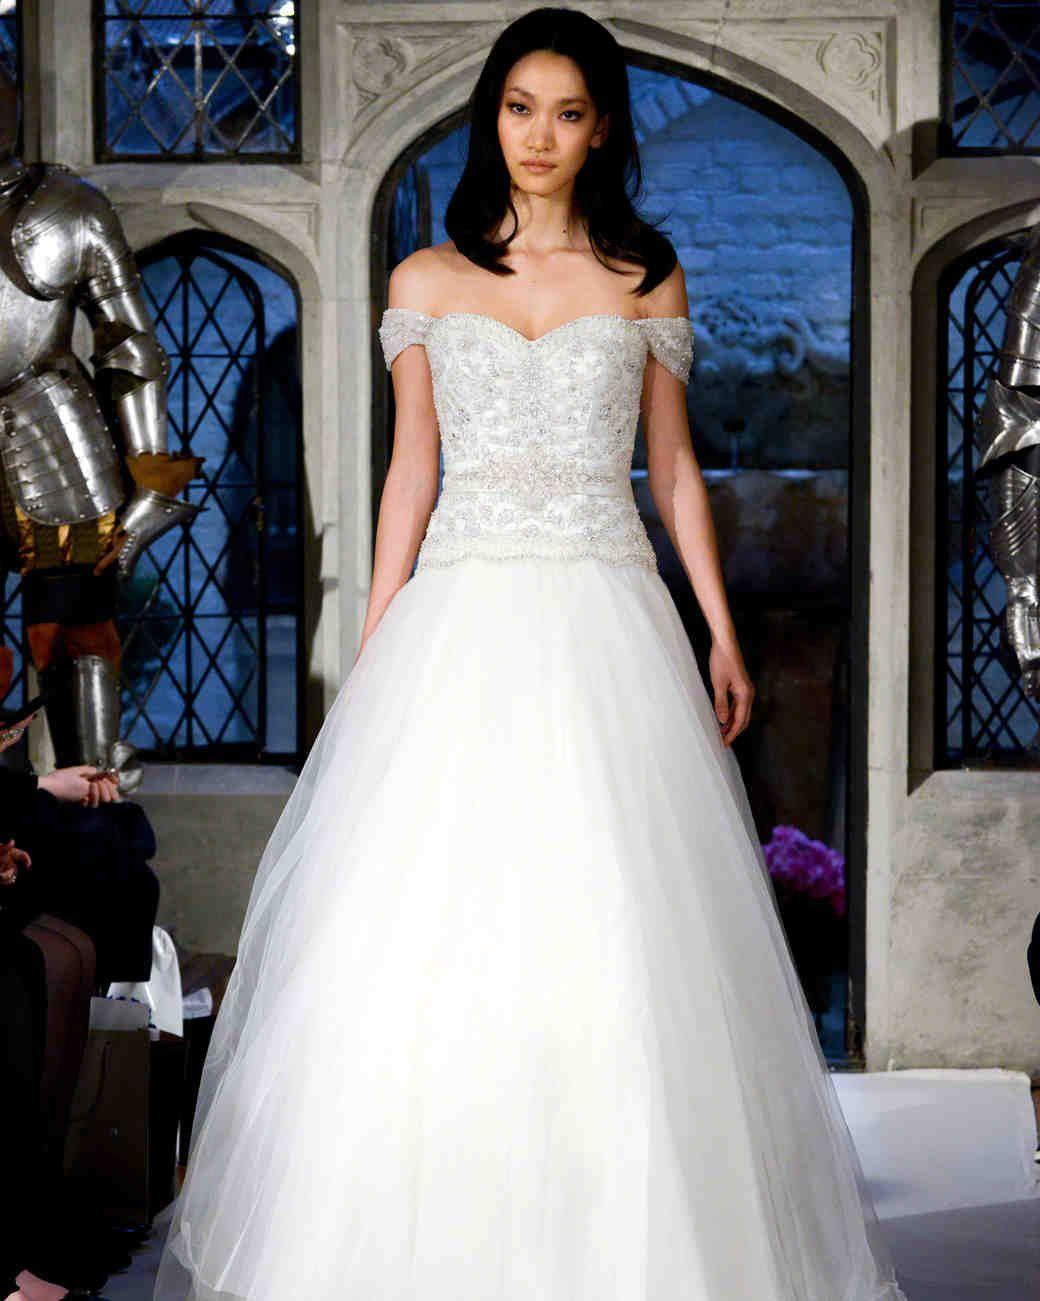 Oleg Cassini Bridal Spring 2018 Spring Weddings And Wedding